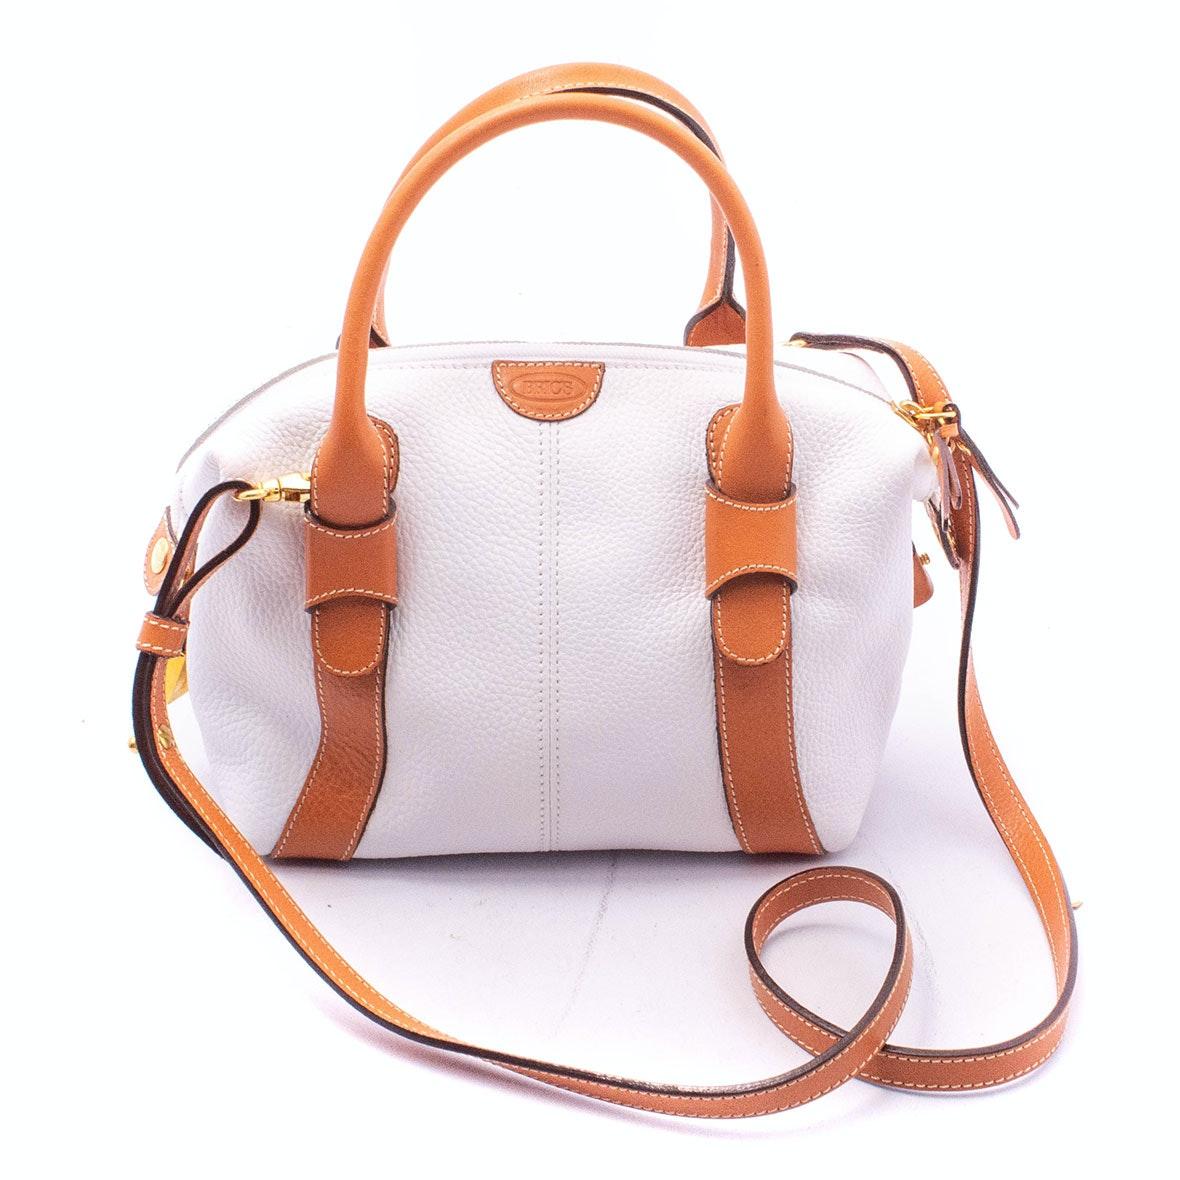 Brics Firenze White Pebble Grain and Tan Leather Duffle Crossbody Bag